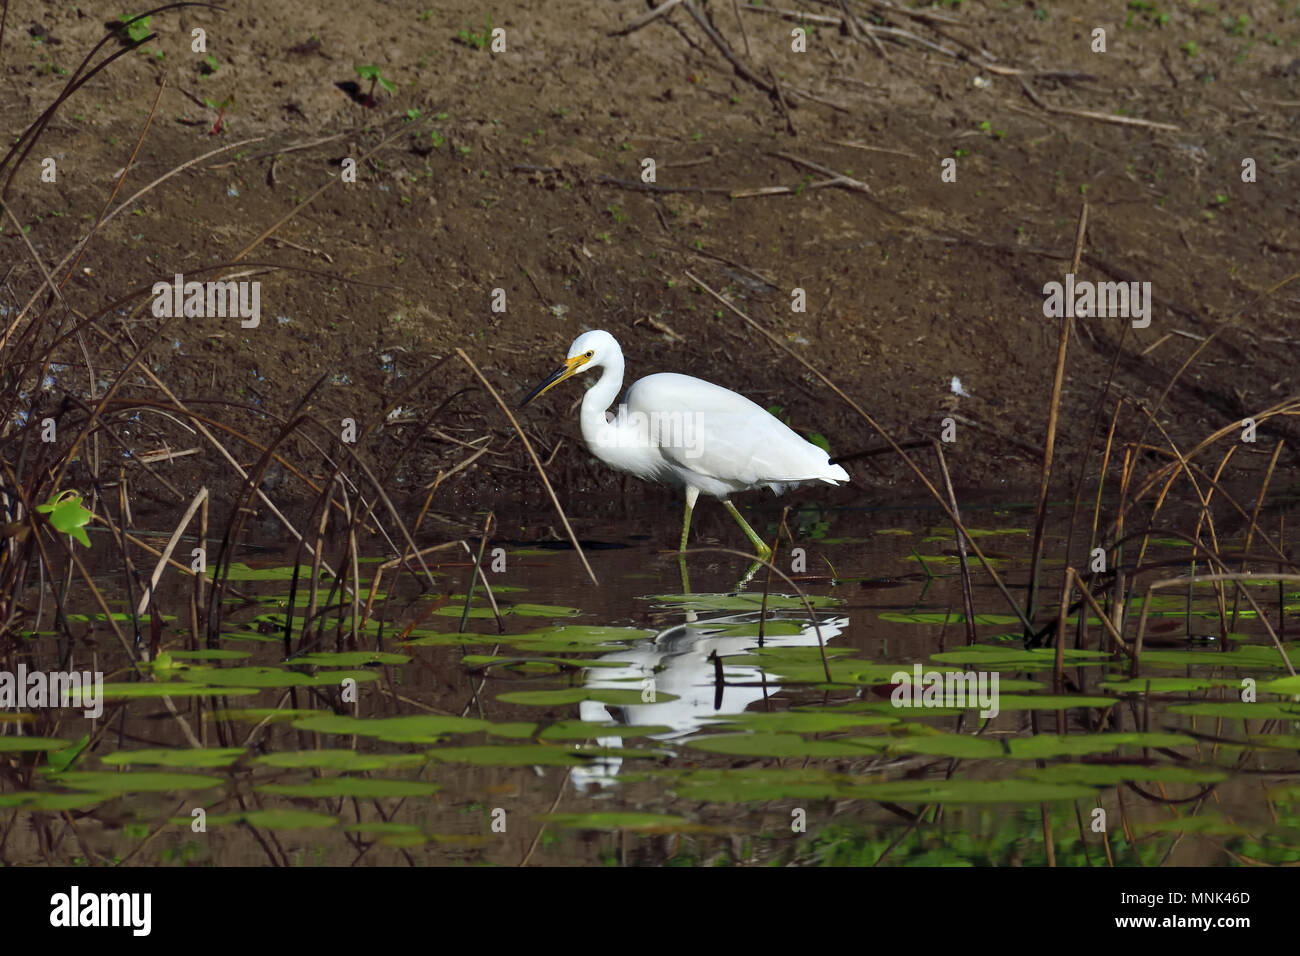 An Australian, Queensland immature Little Egret, Egretta garzetta looking for food in a Lagoon - Stock Image